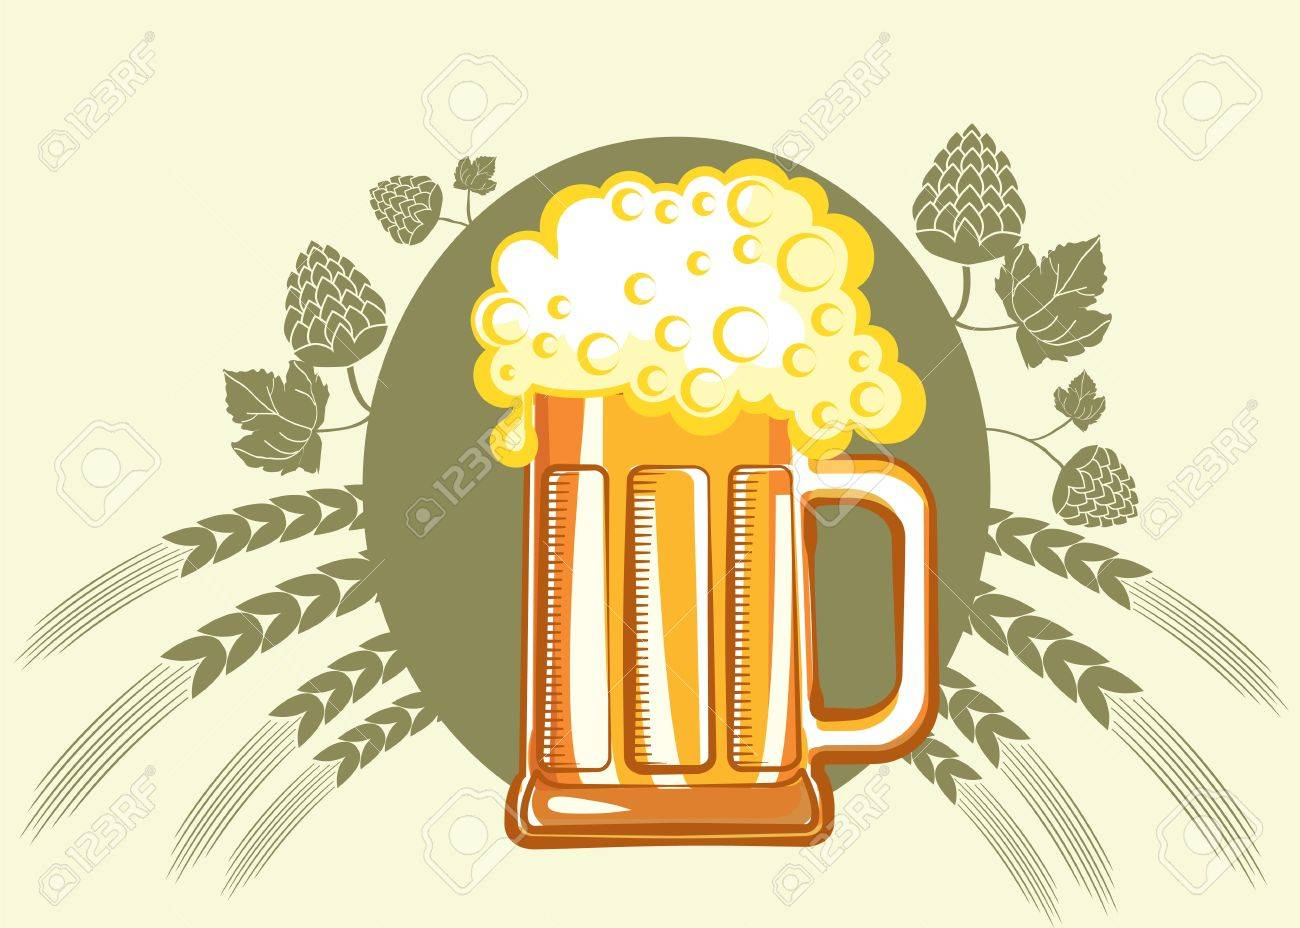 Glass of beer. color symbol of Illustration for design Stock Vector - 9533121